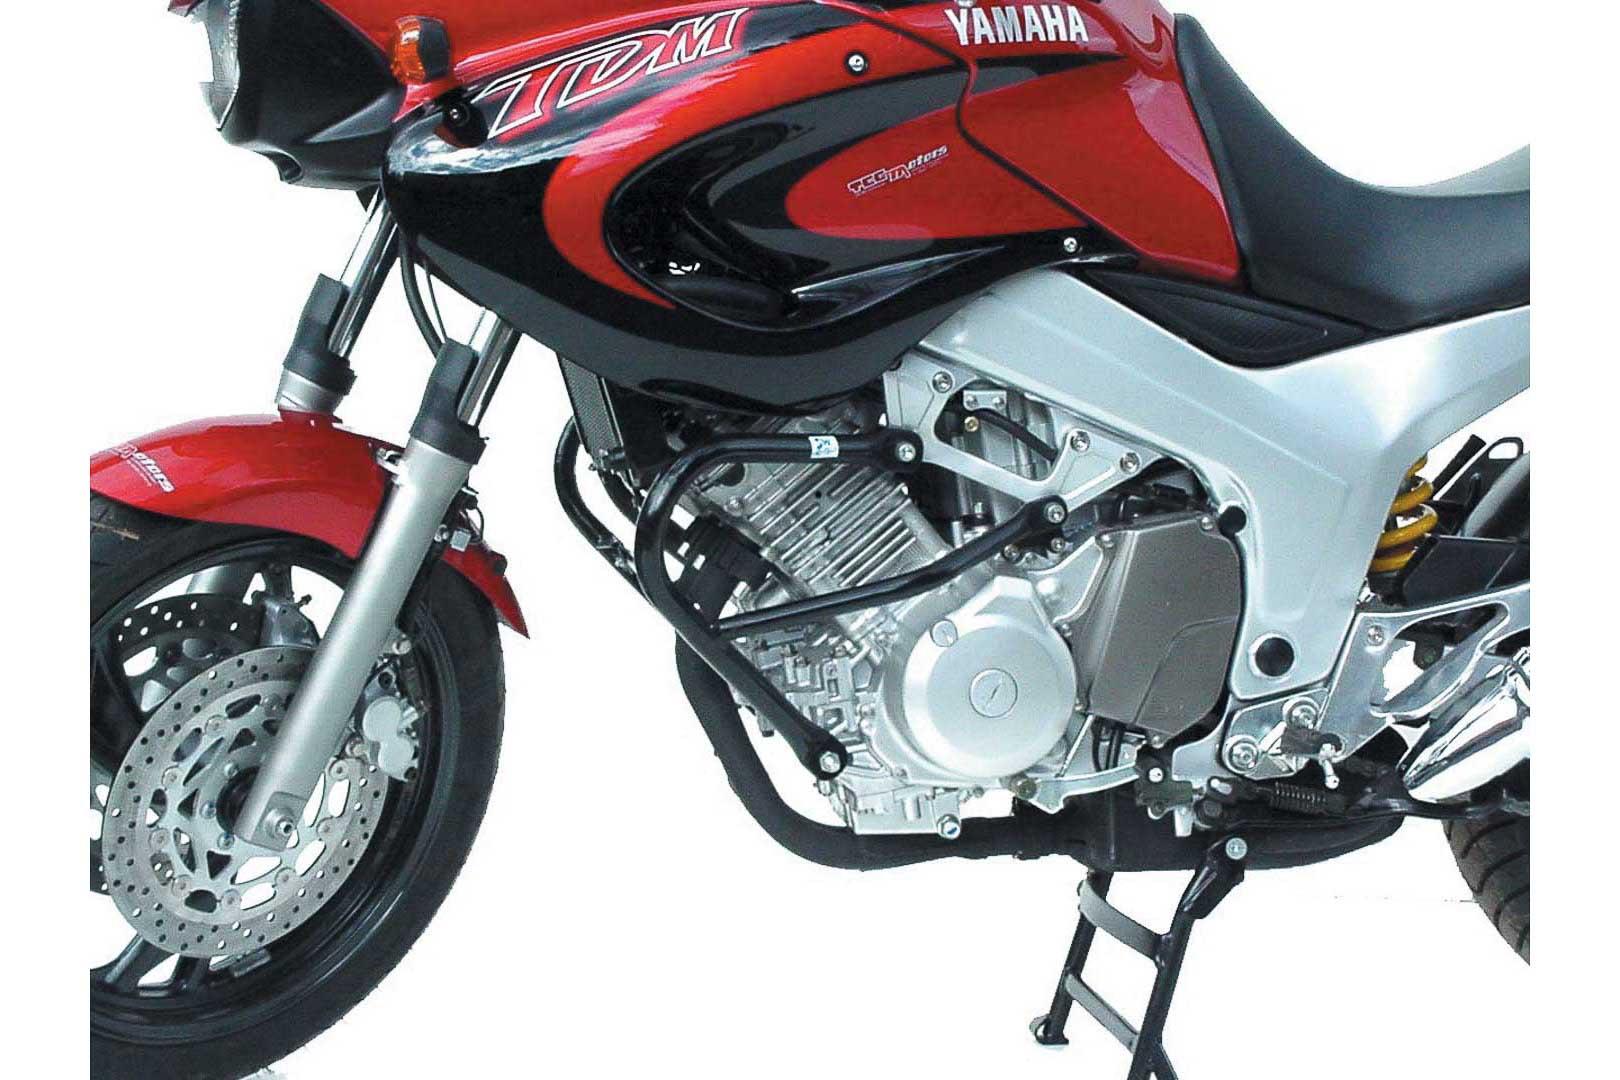 SW-Motech Moottorinsuojarauta Yamaha TDM850 musta